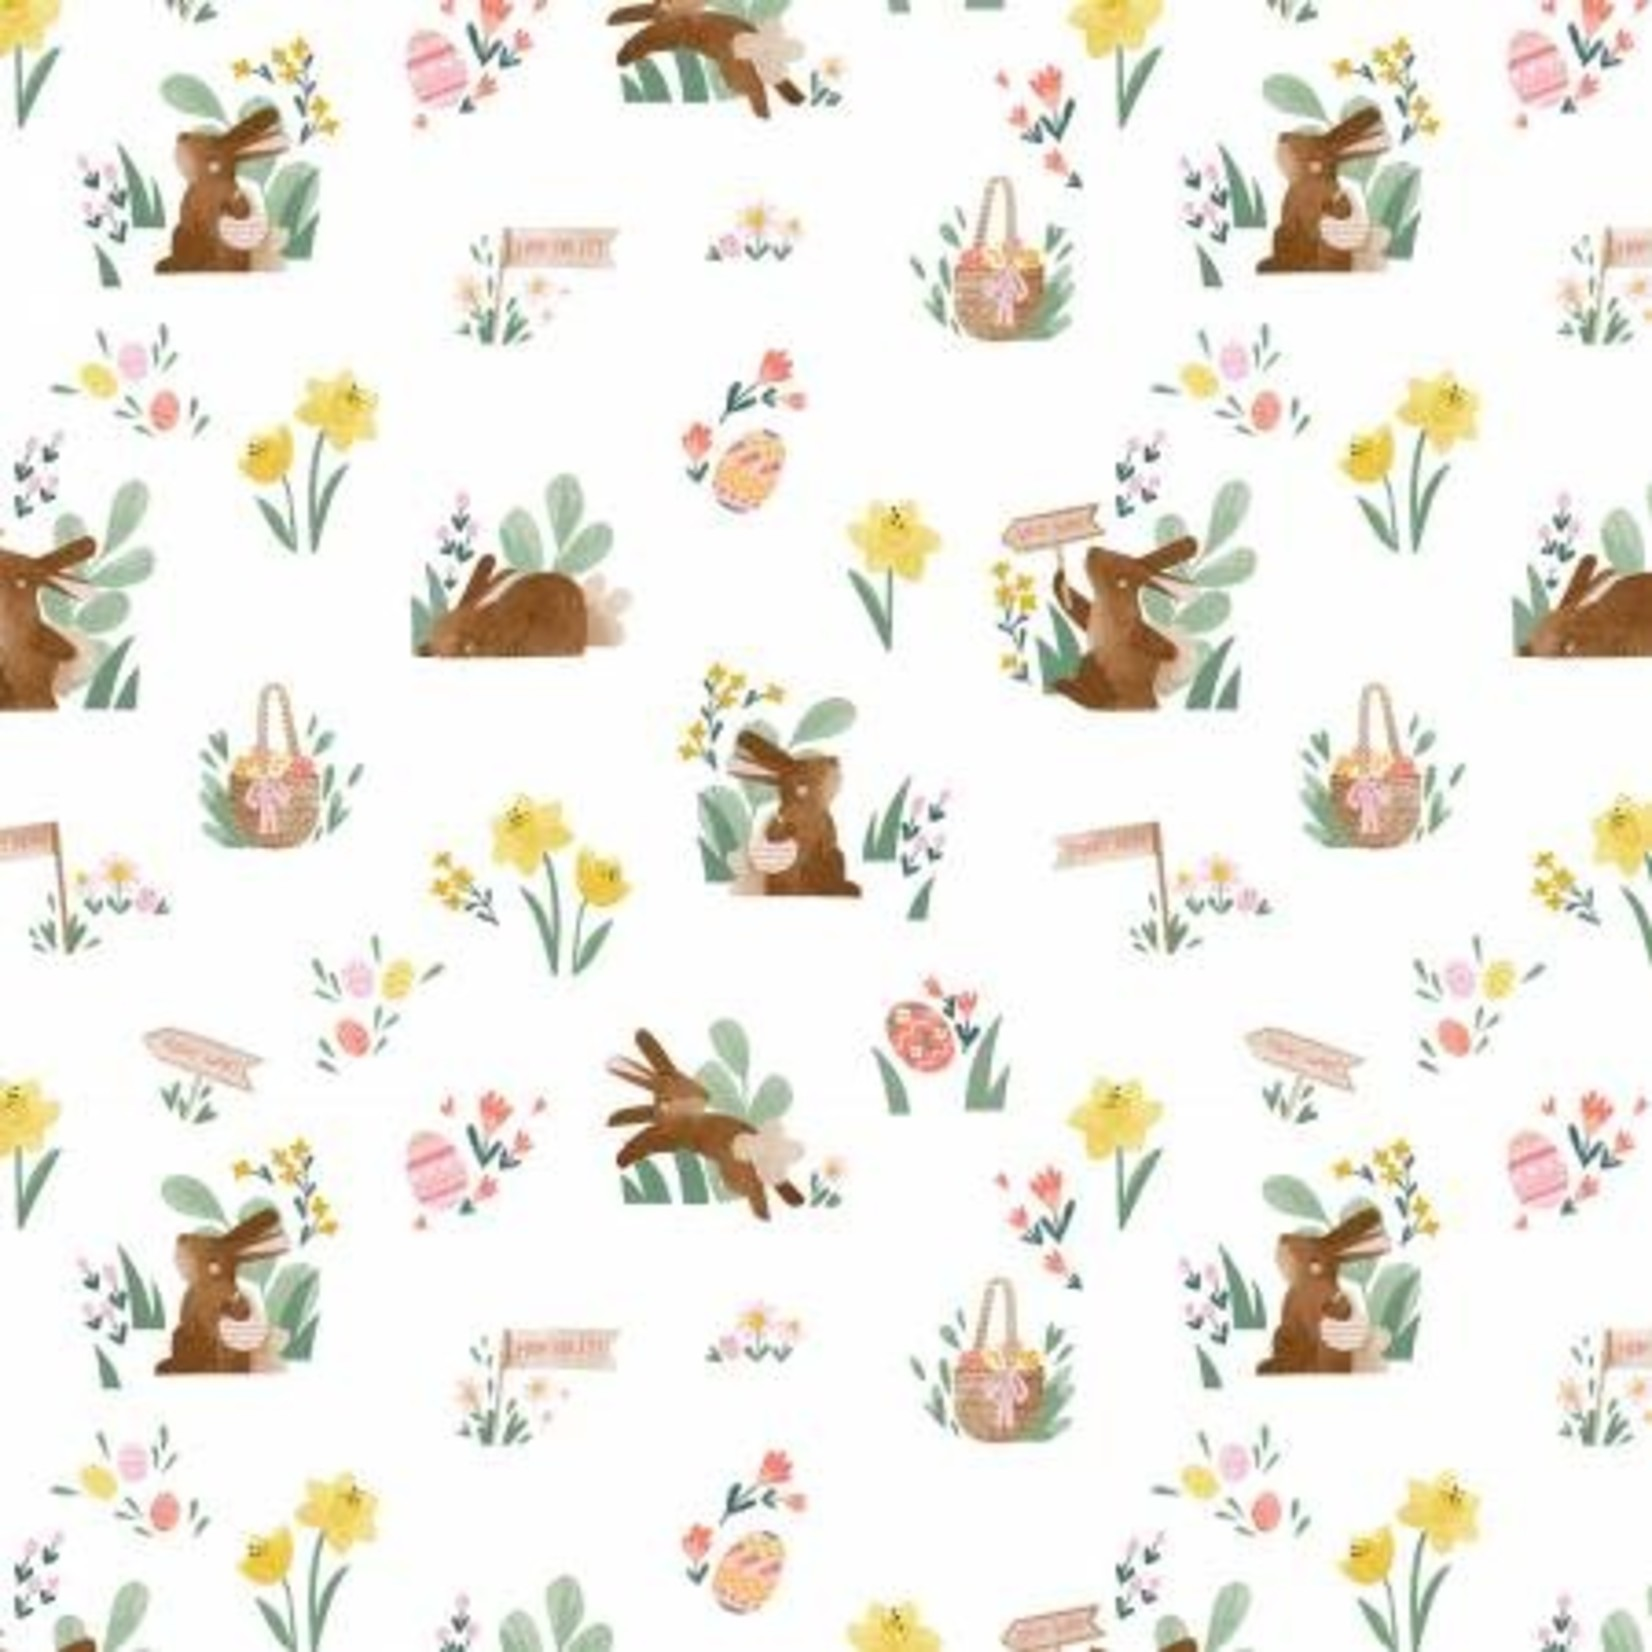 Riley Blake Designs Easter Egg Hunt, Bunnies & Baskets Main, White  $0.20 per cm or $20/m